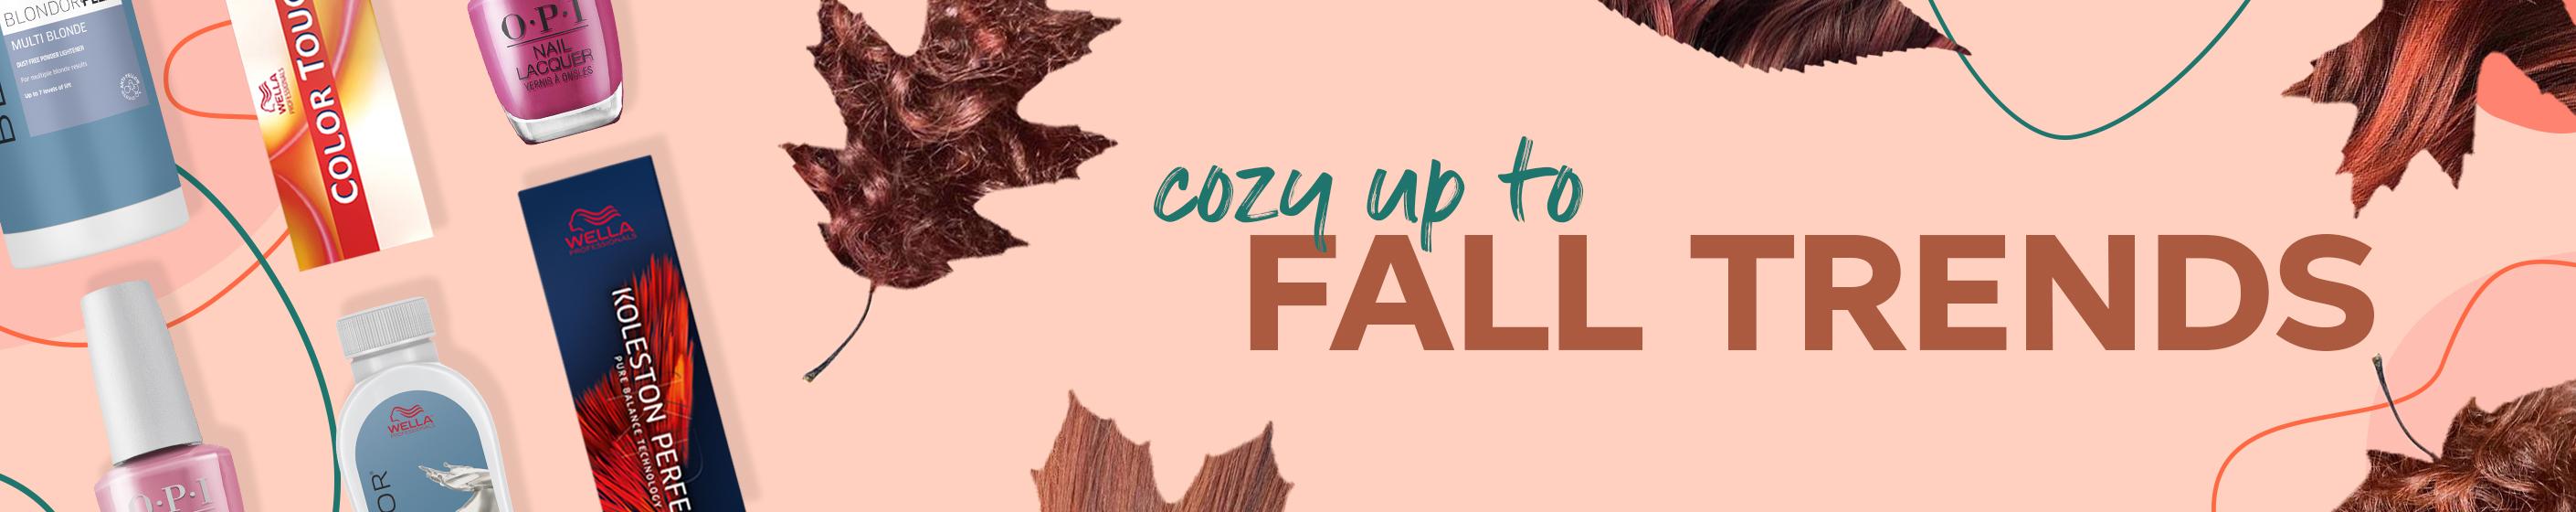 Fall Trends: Fall into cozy season